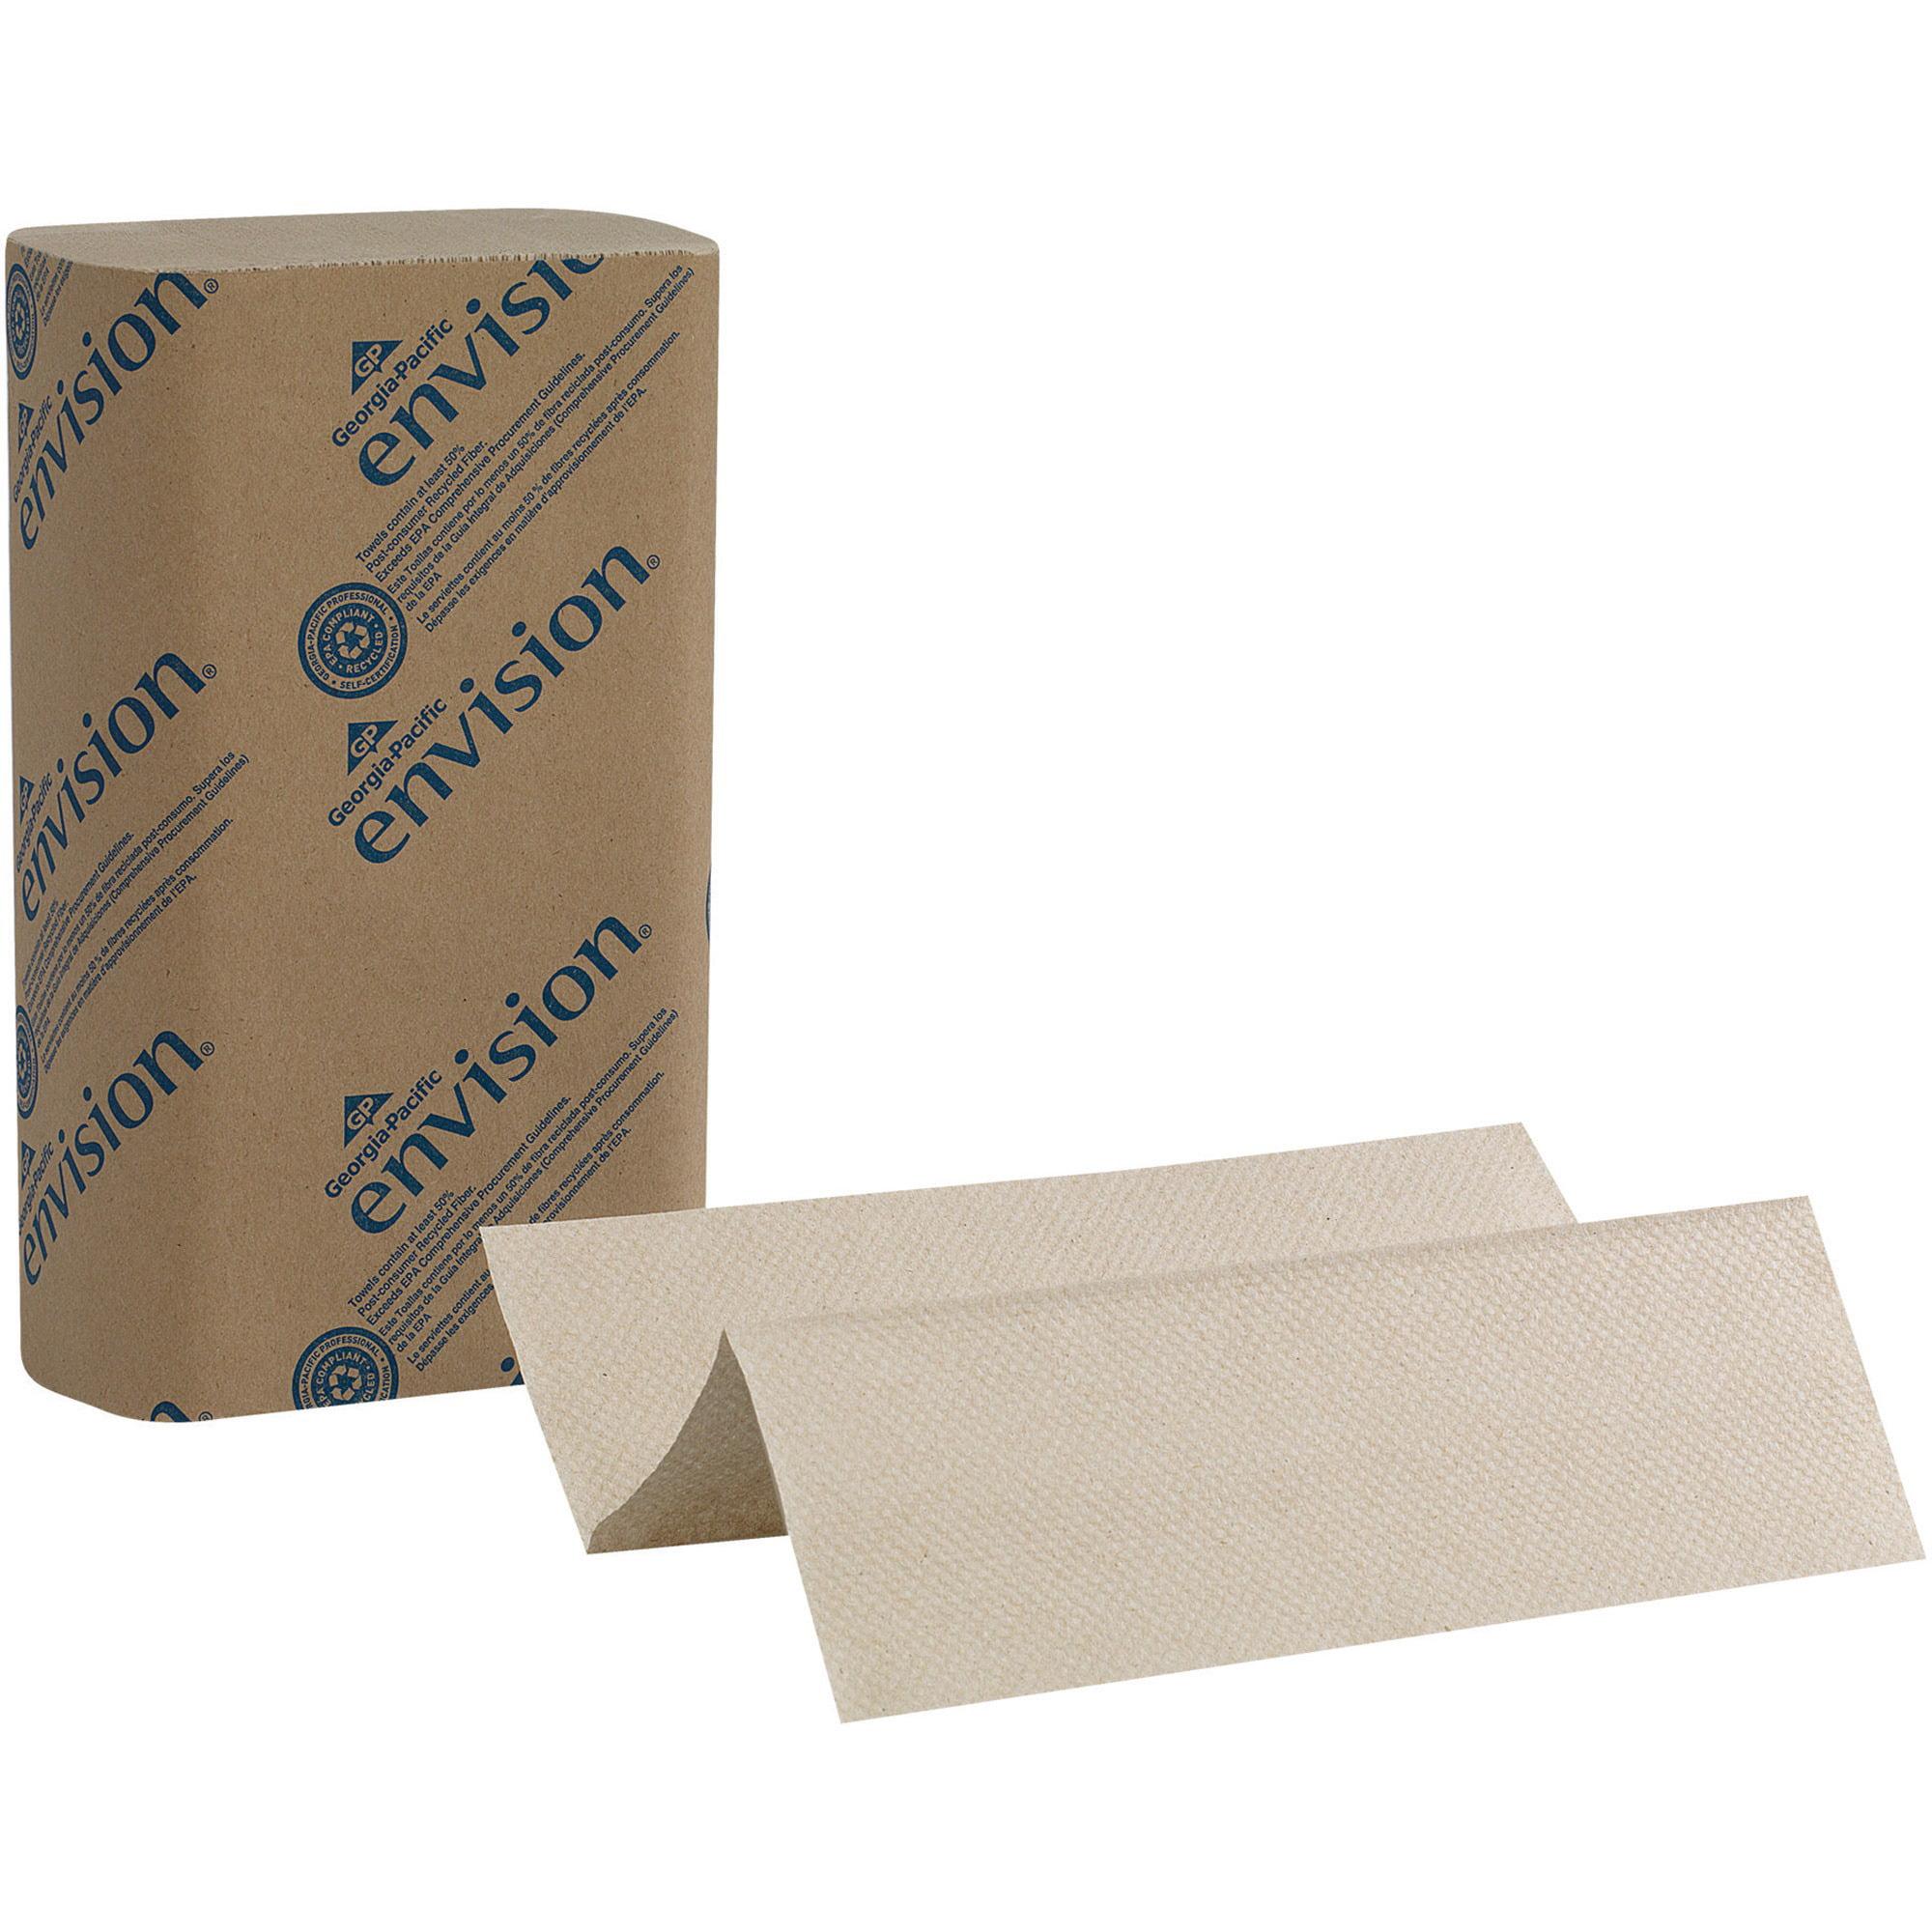 Georgia-Pacific Acclaim Multifold Paper Towels